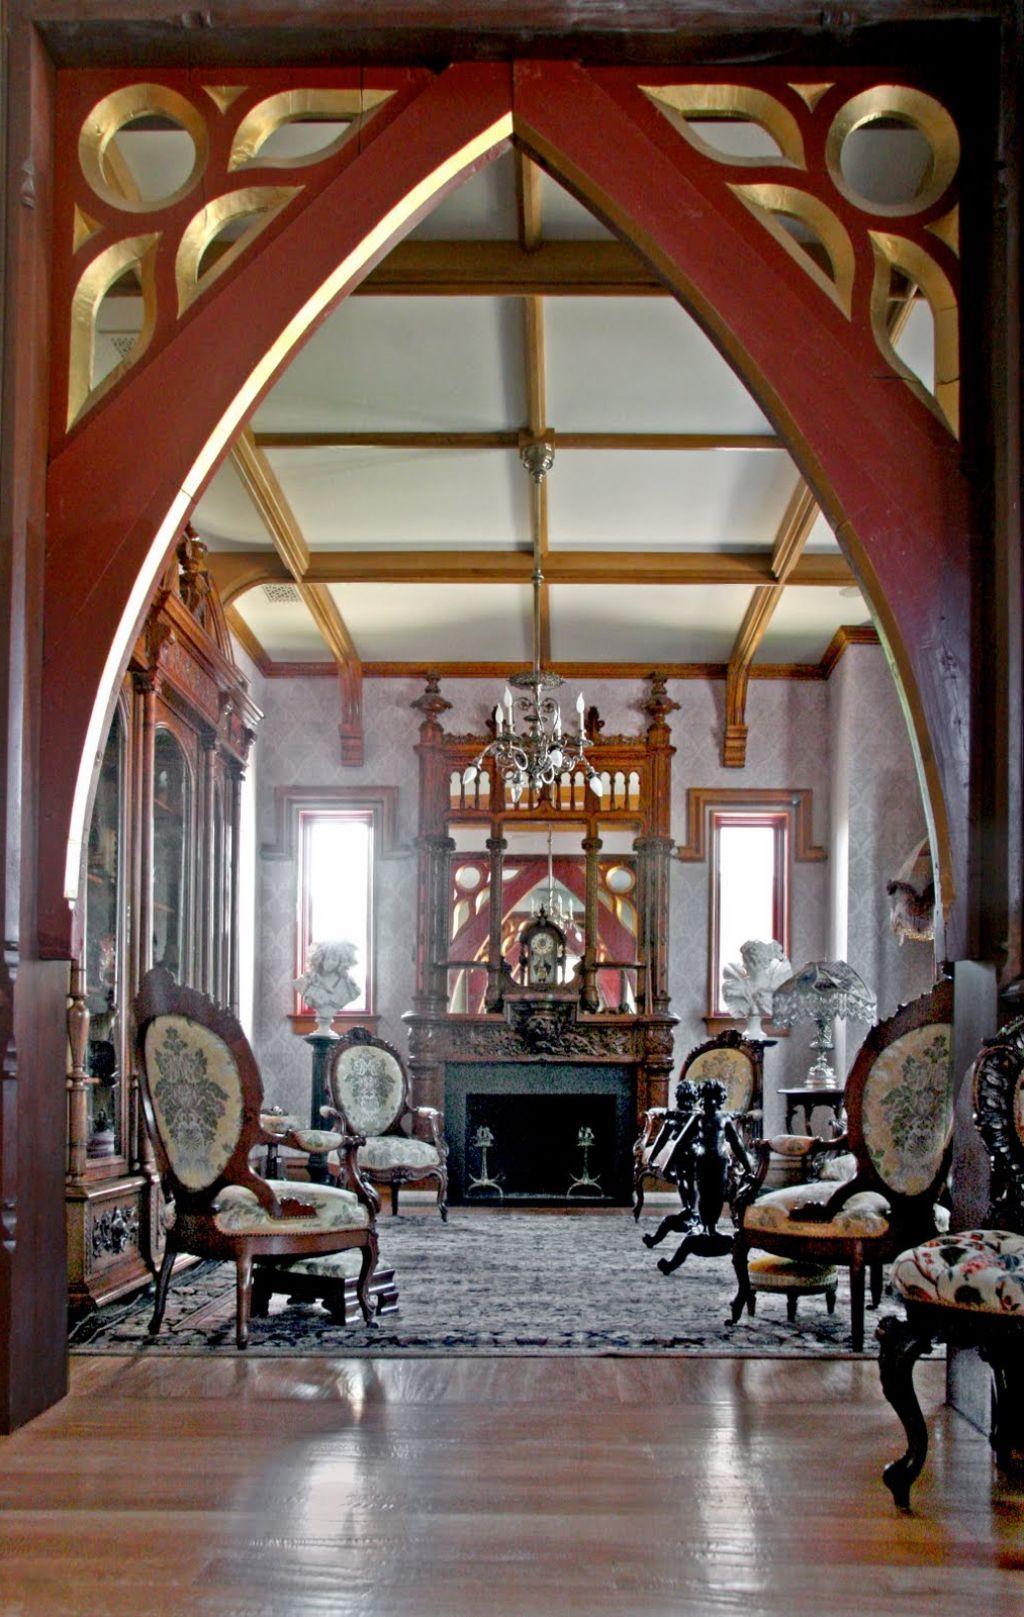 Interior , Gothic Interior Design For Dark But Attractive Home Decor Ideas  : Inspiring Gothic Interior